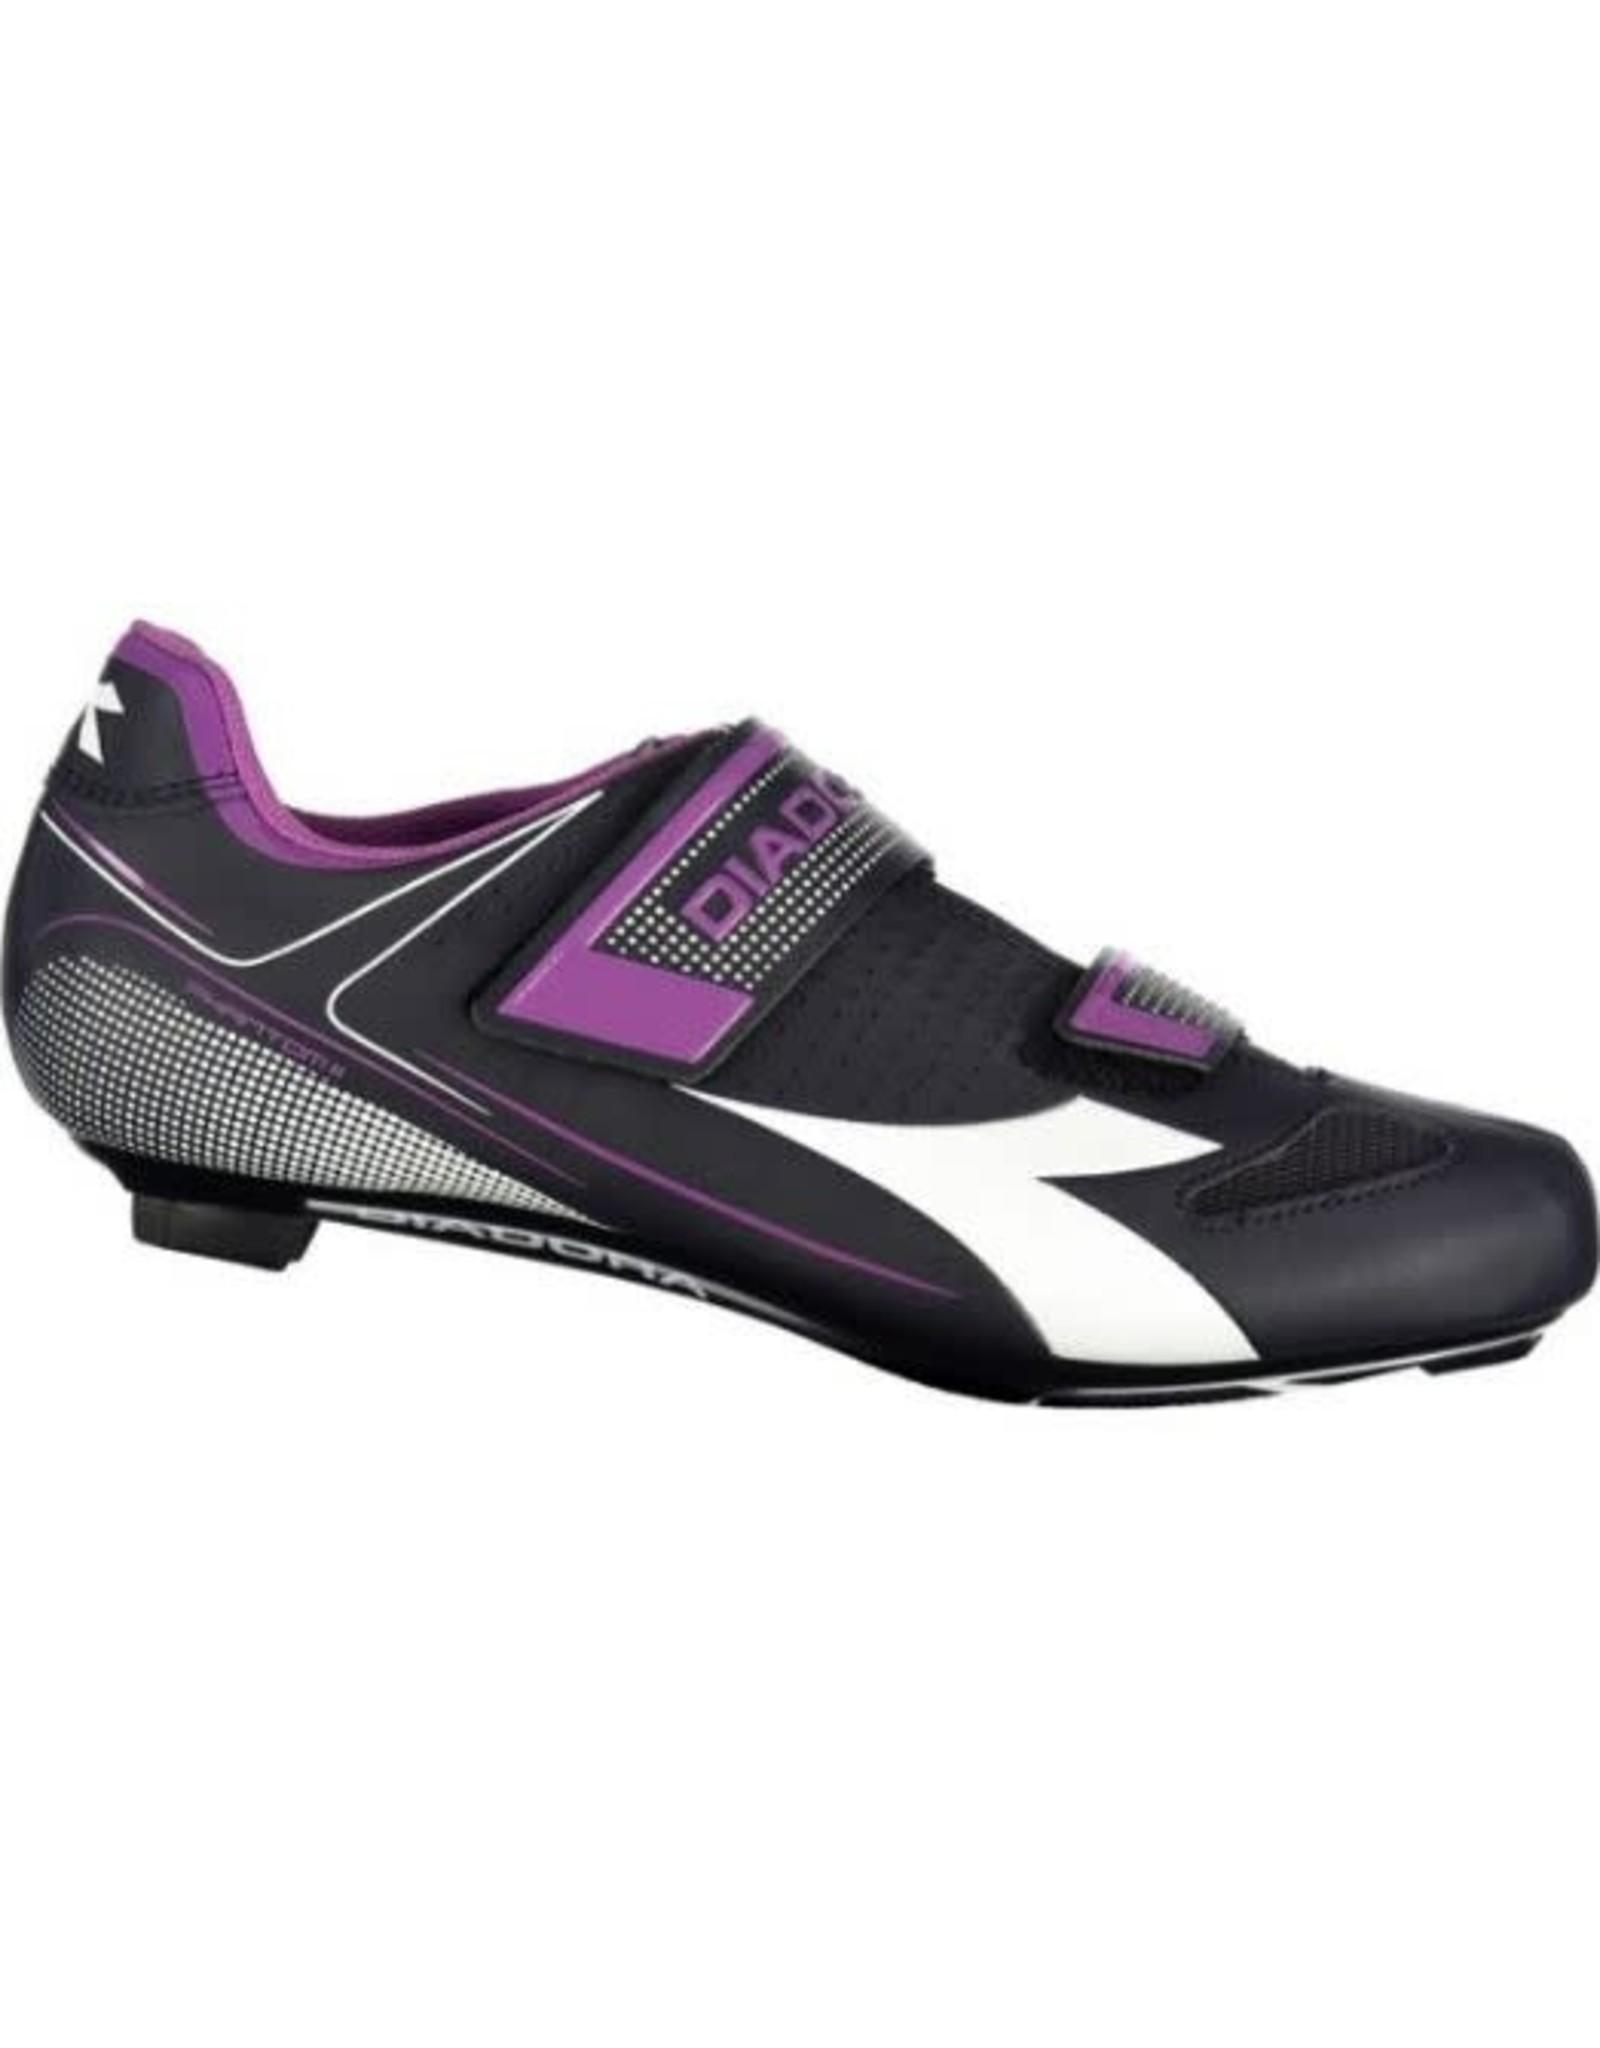 Diadora Shoes Diadora Phantom II F smoke purple/white #38